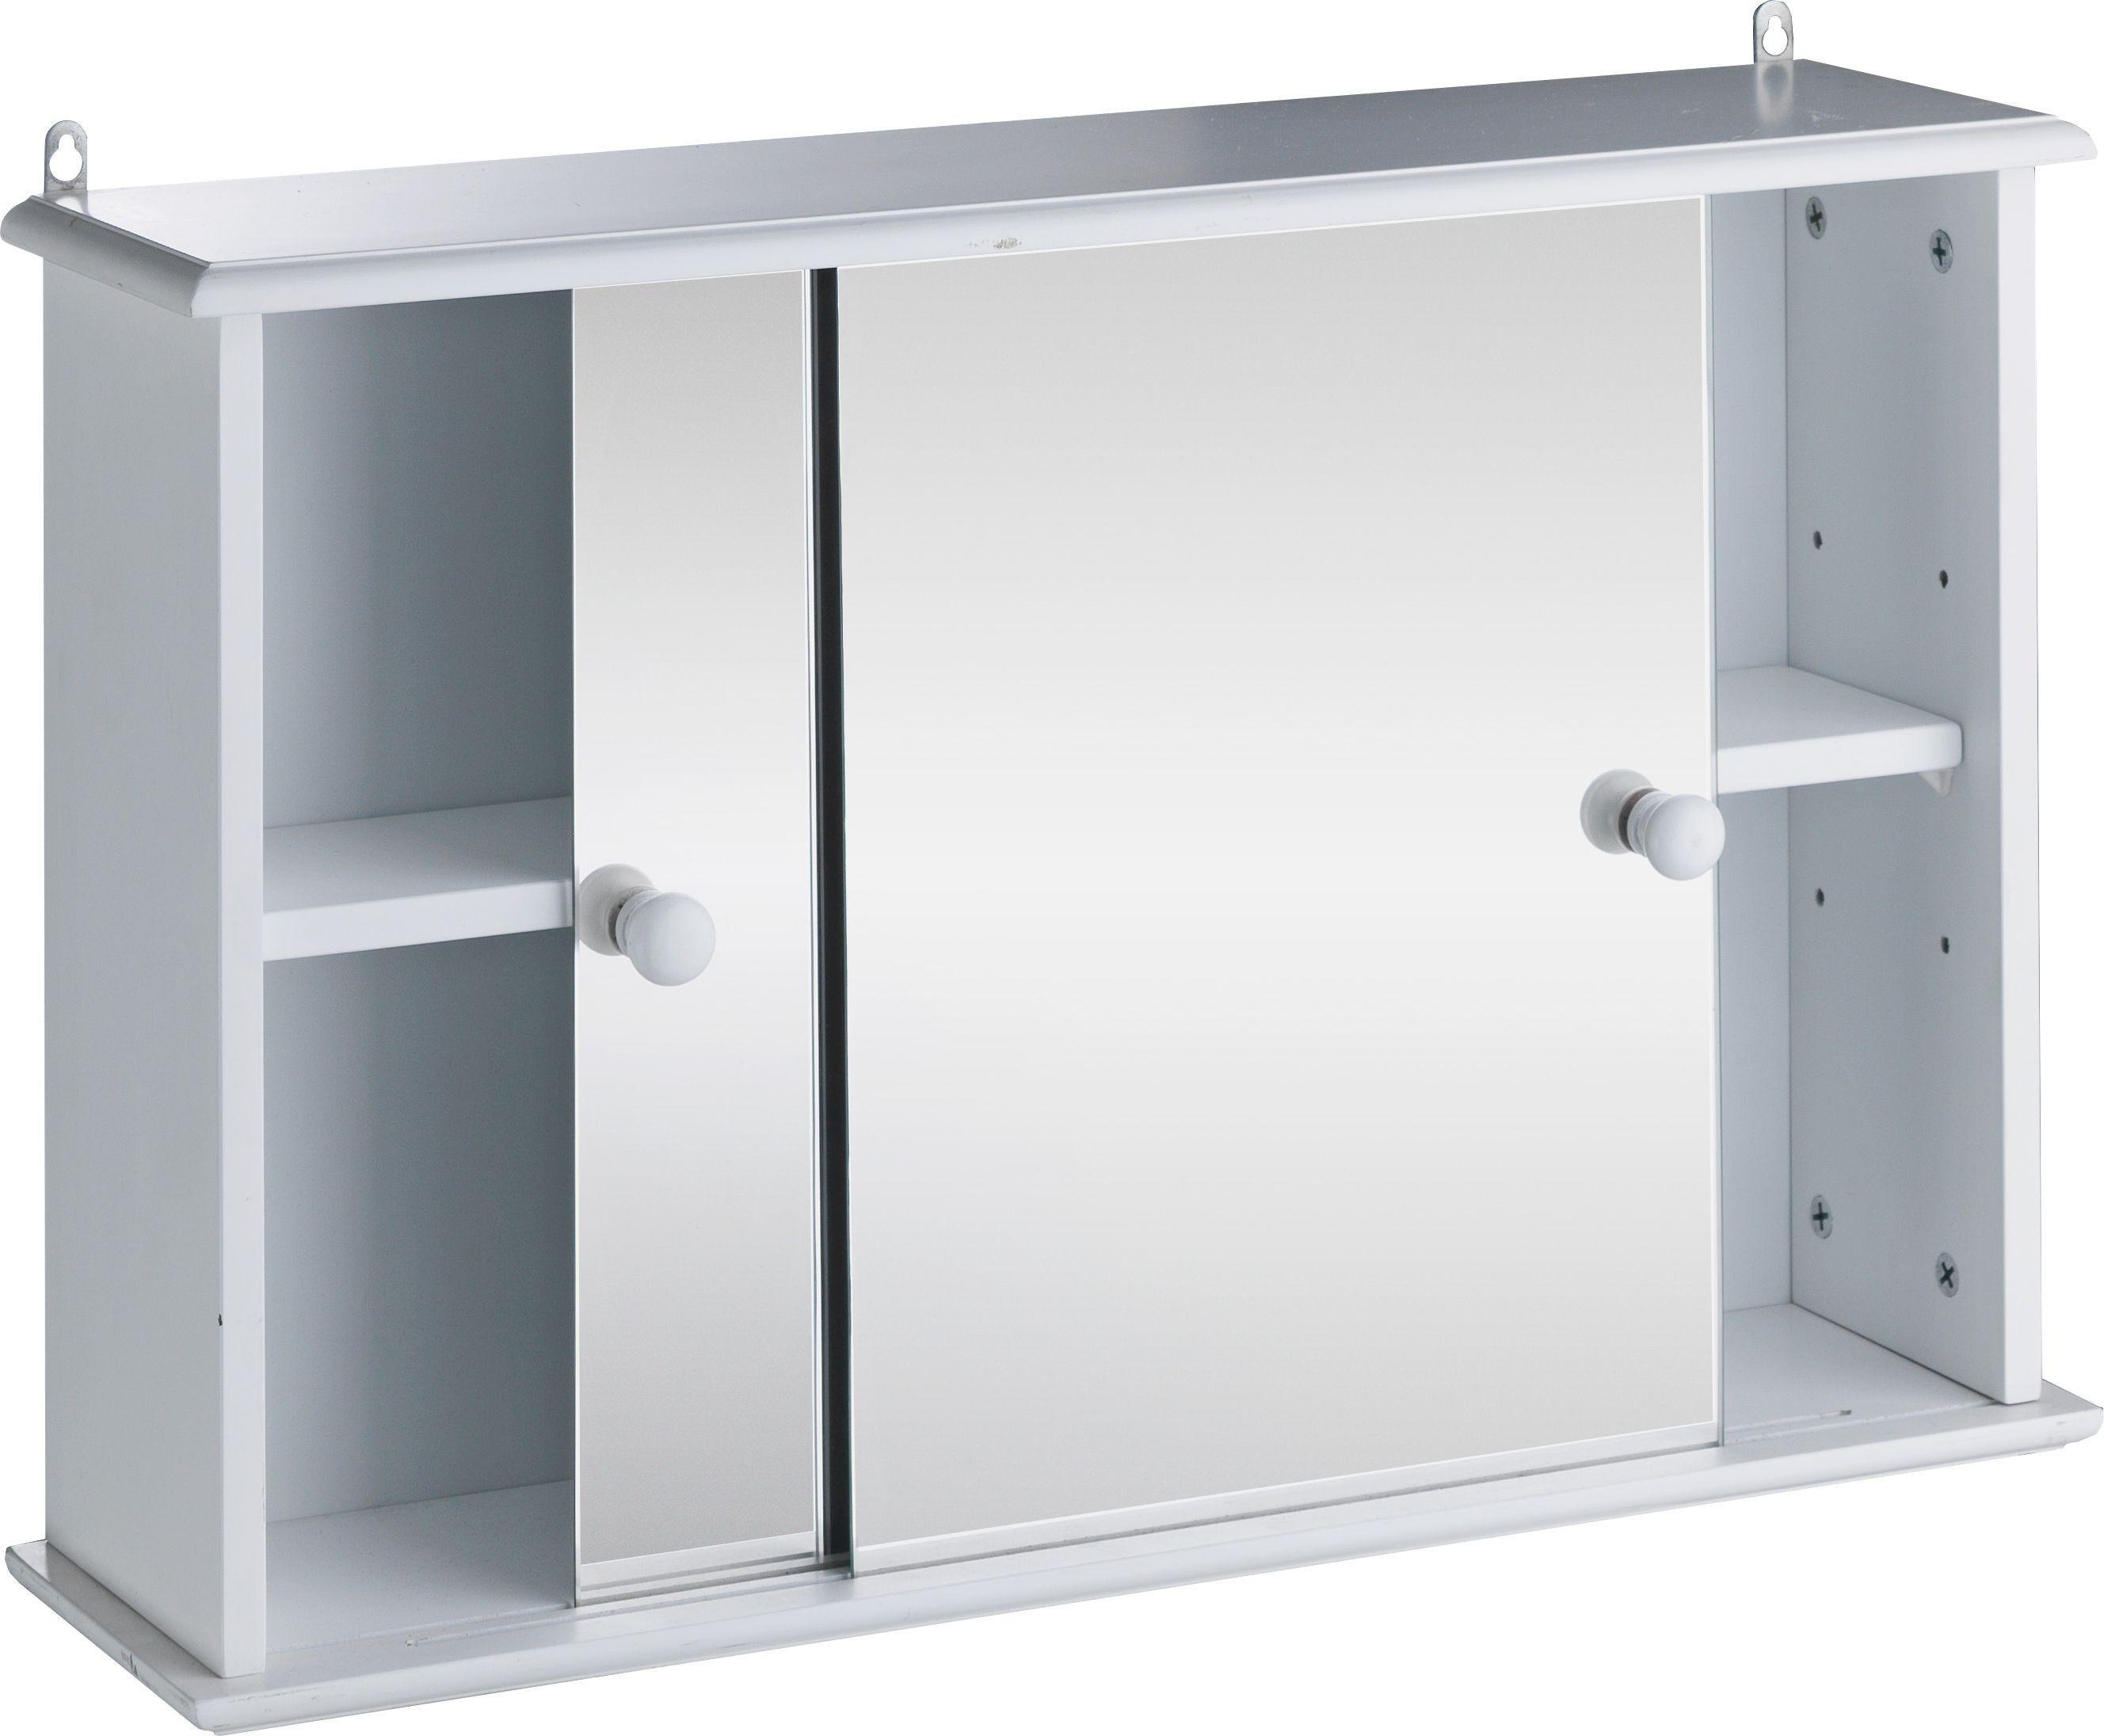 Argos Stainless Steel Double Mirrored Door Bathroom Cabinet Bathroom Sink Cabinets Argos With